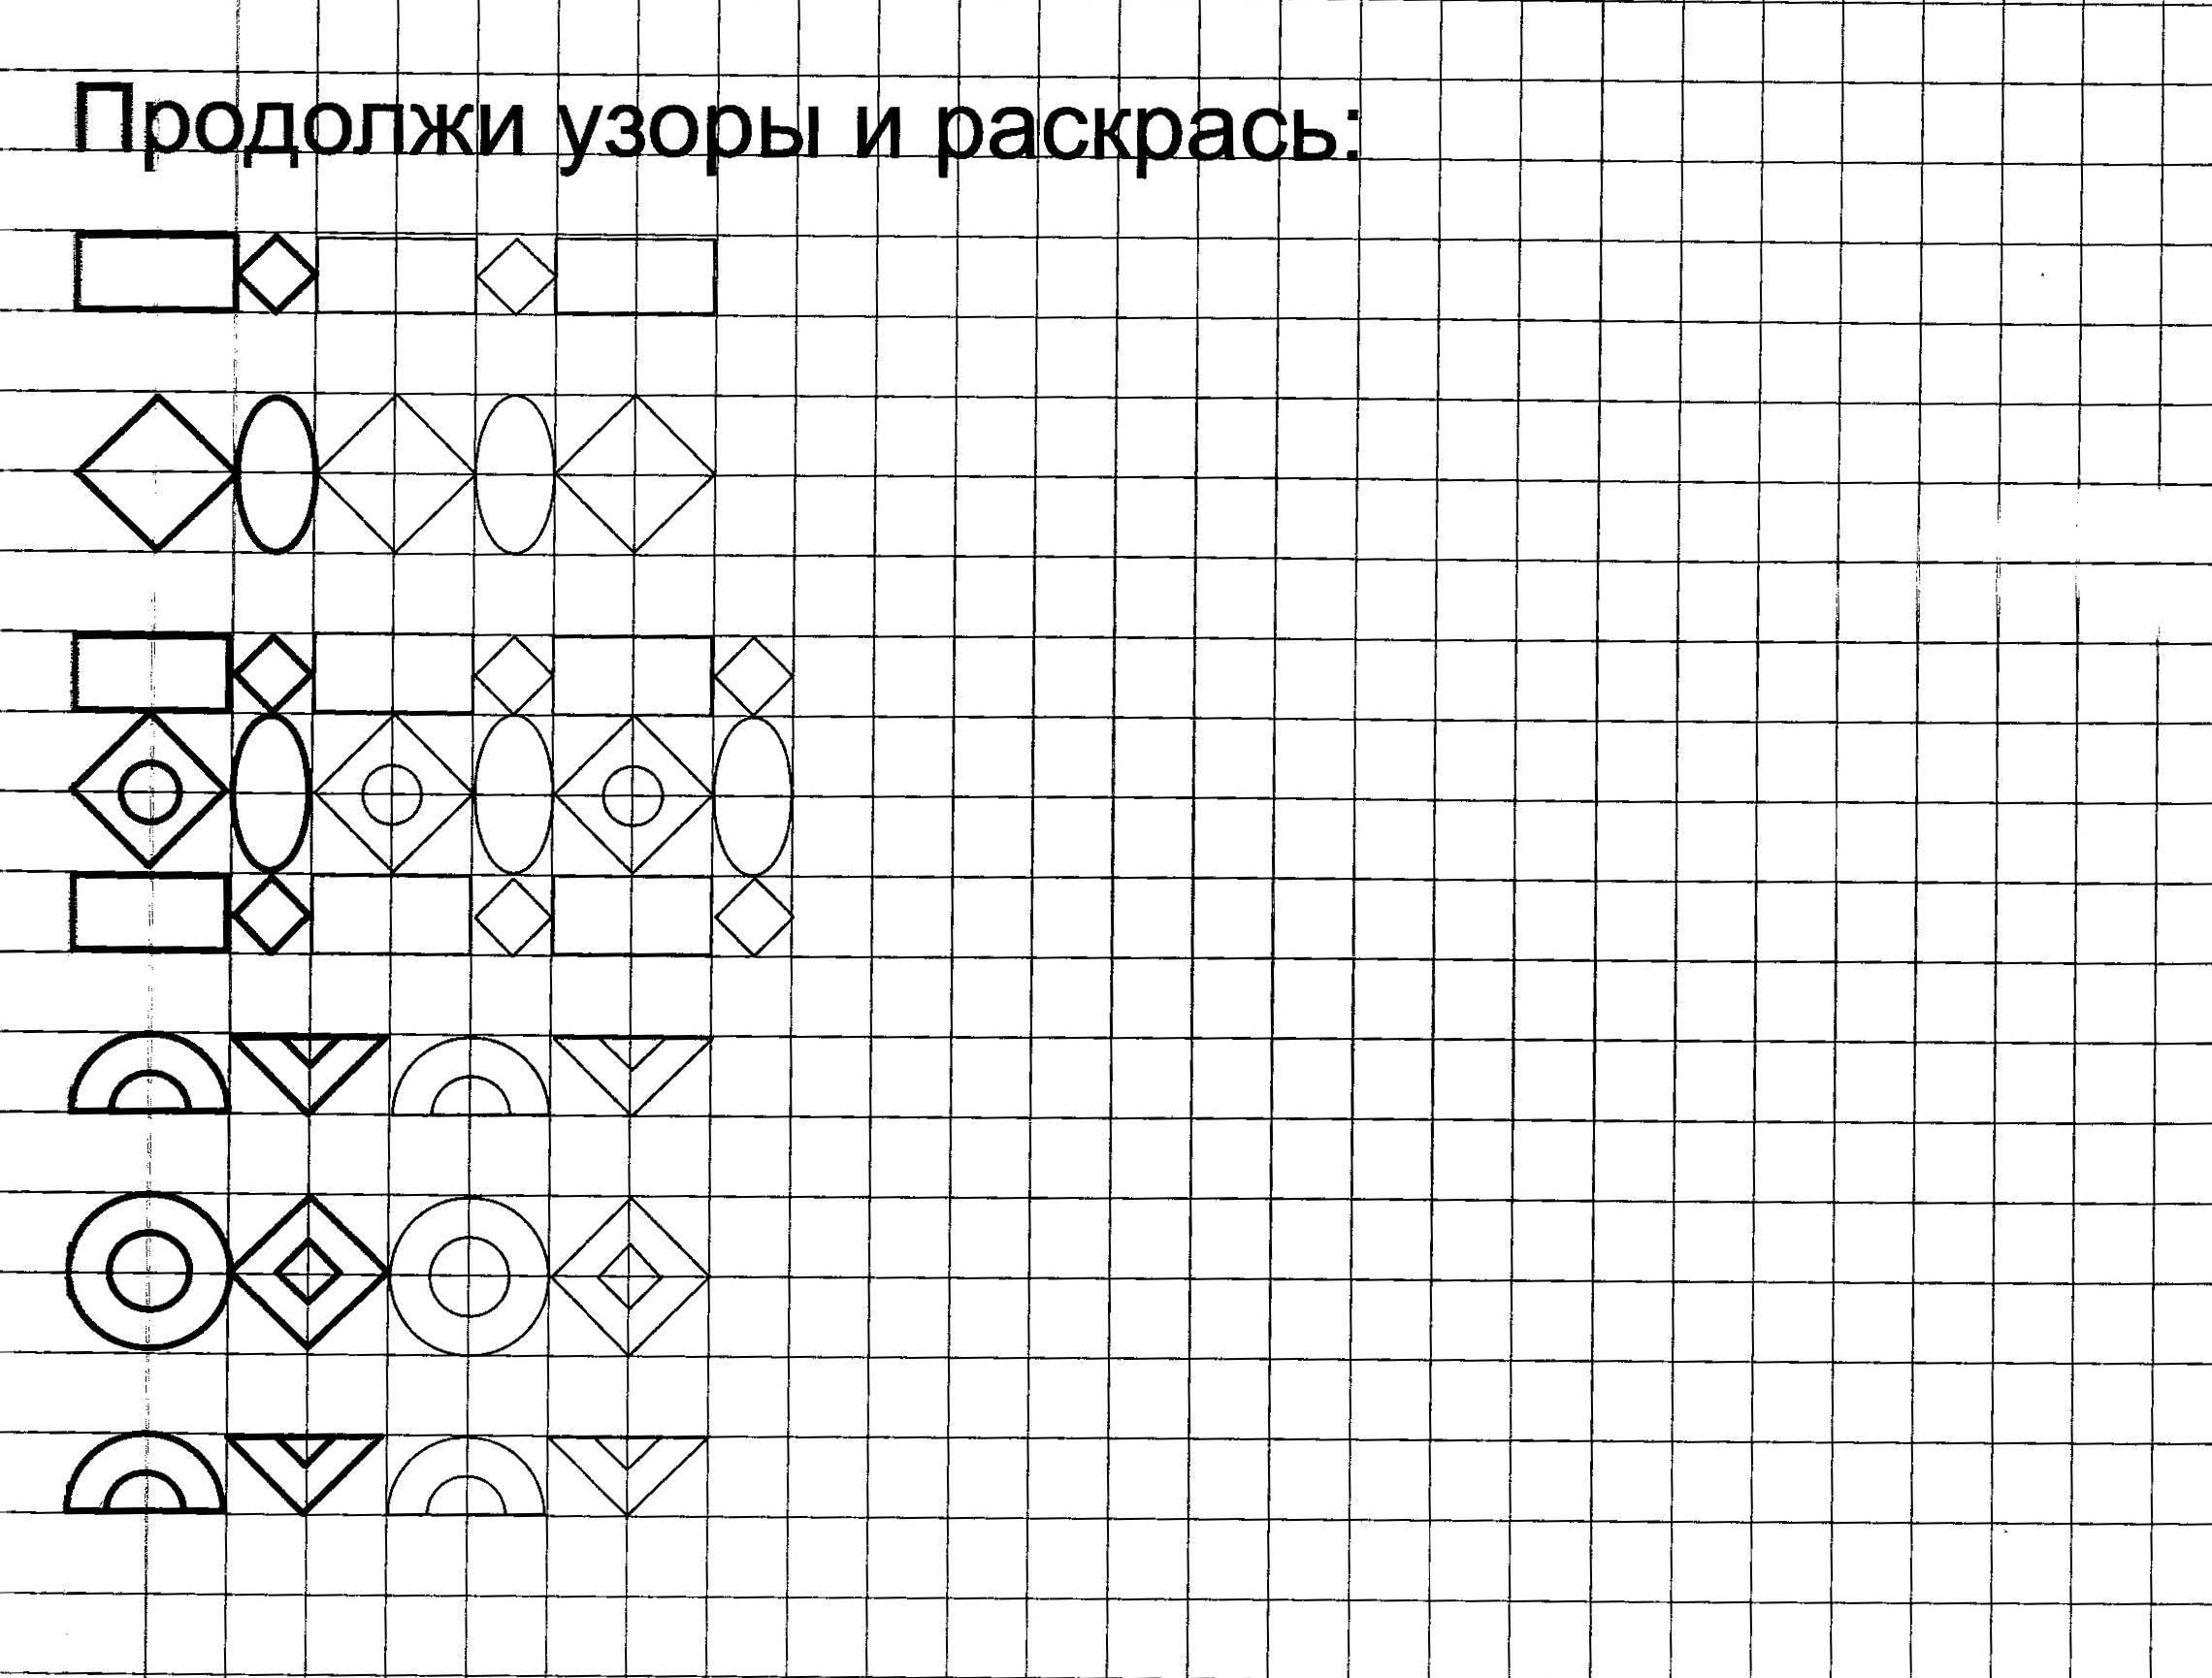 Узоры по математике 1 класс